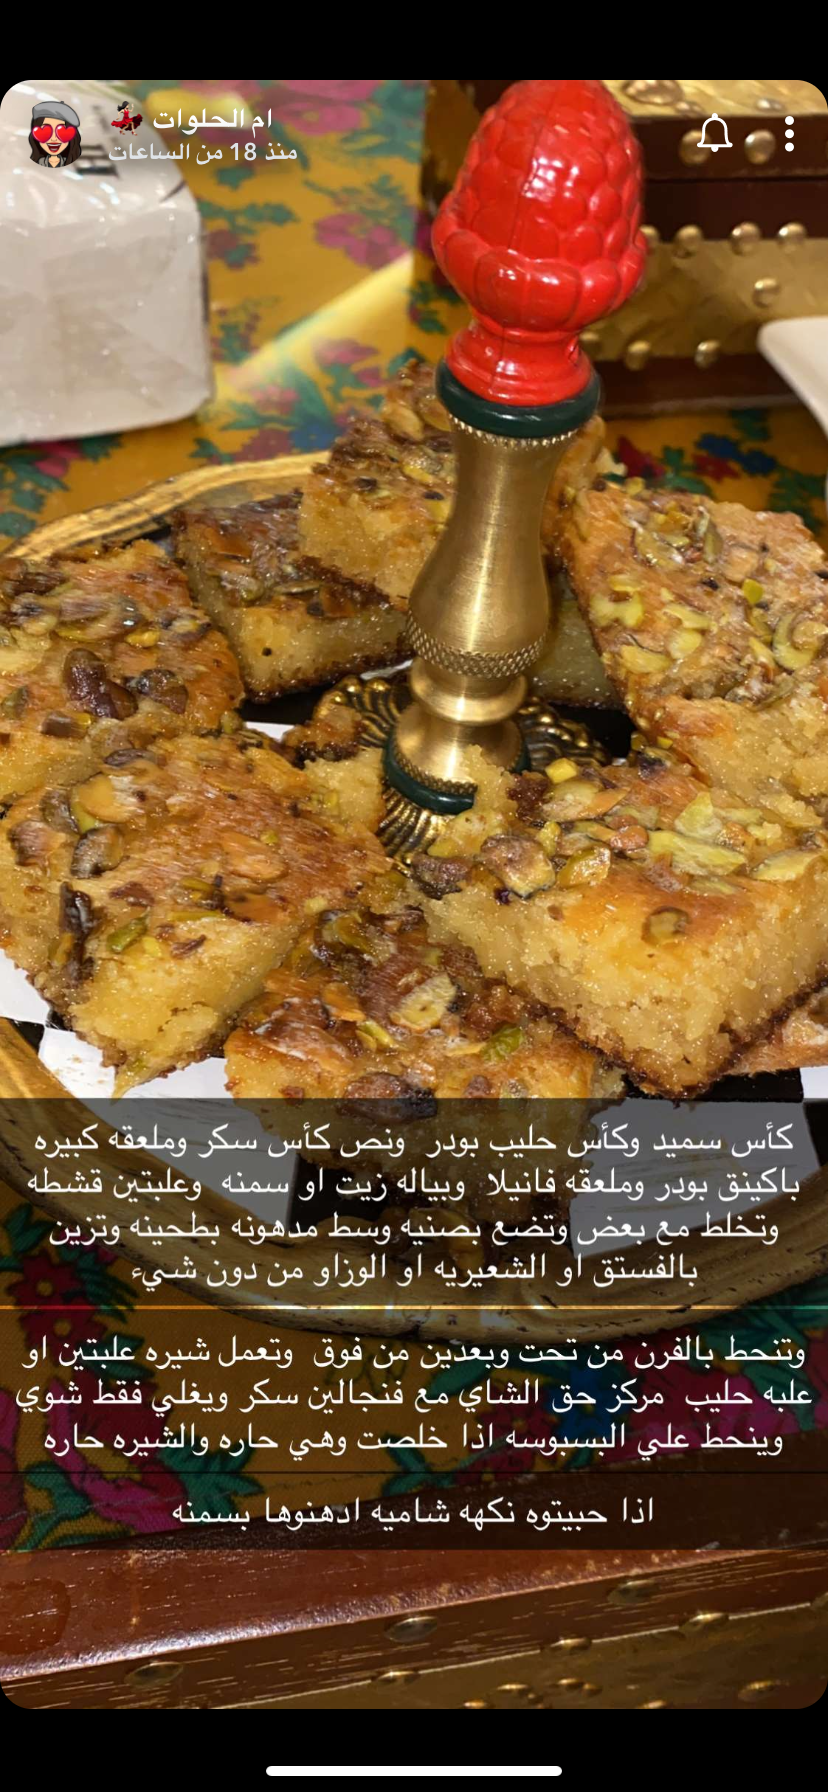 Pin By Hana On حلويات Sweets Recipes Food Sweets